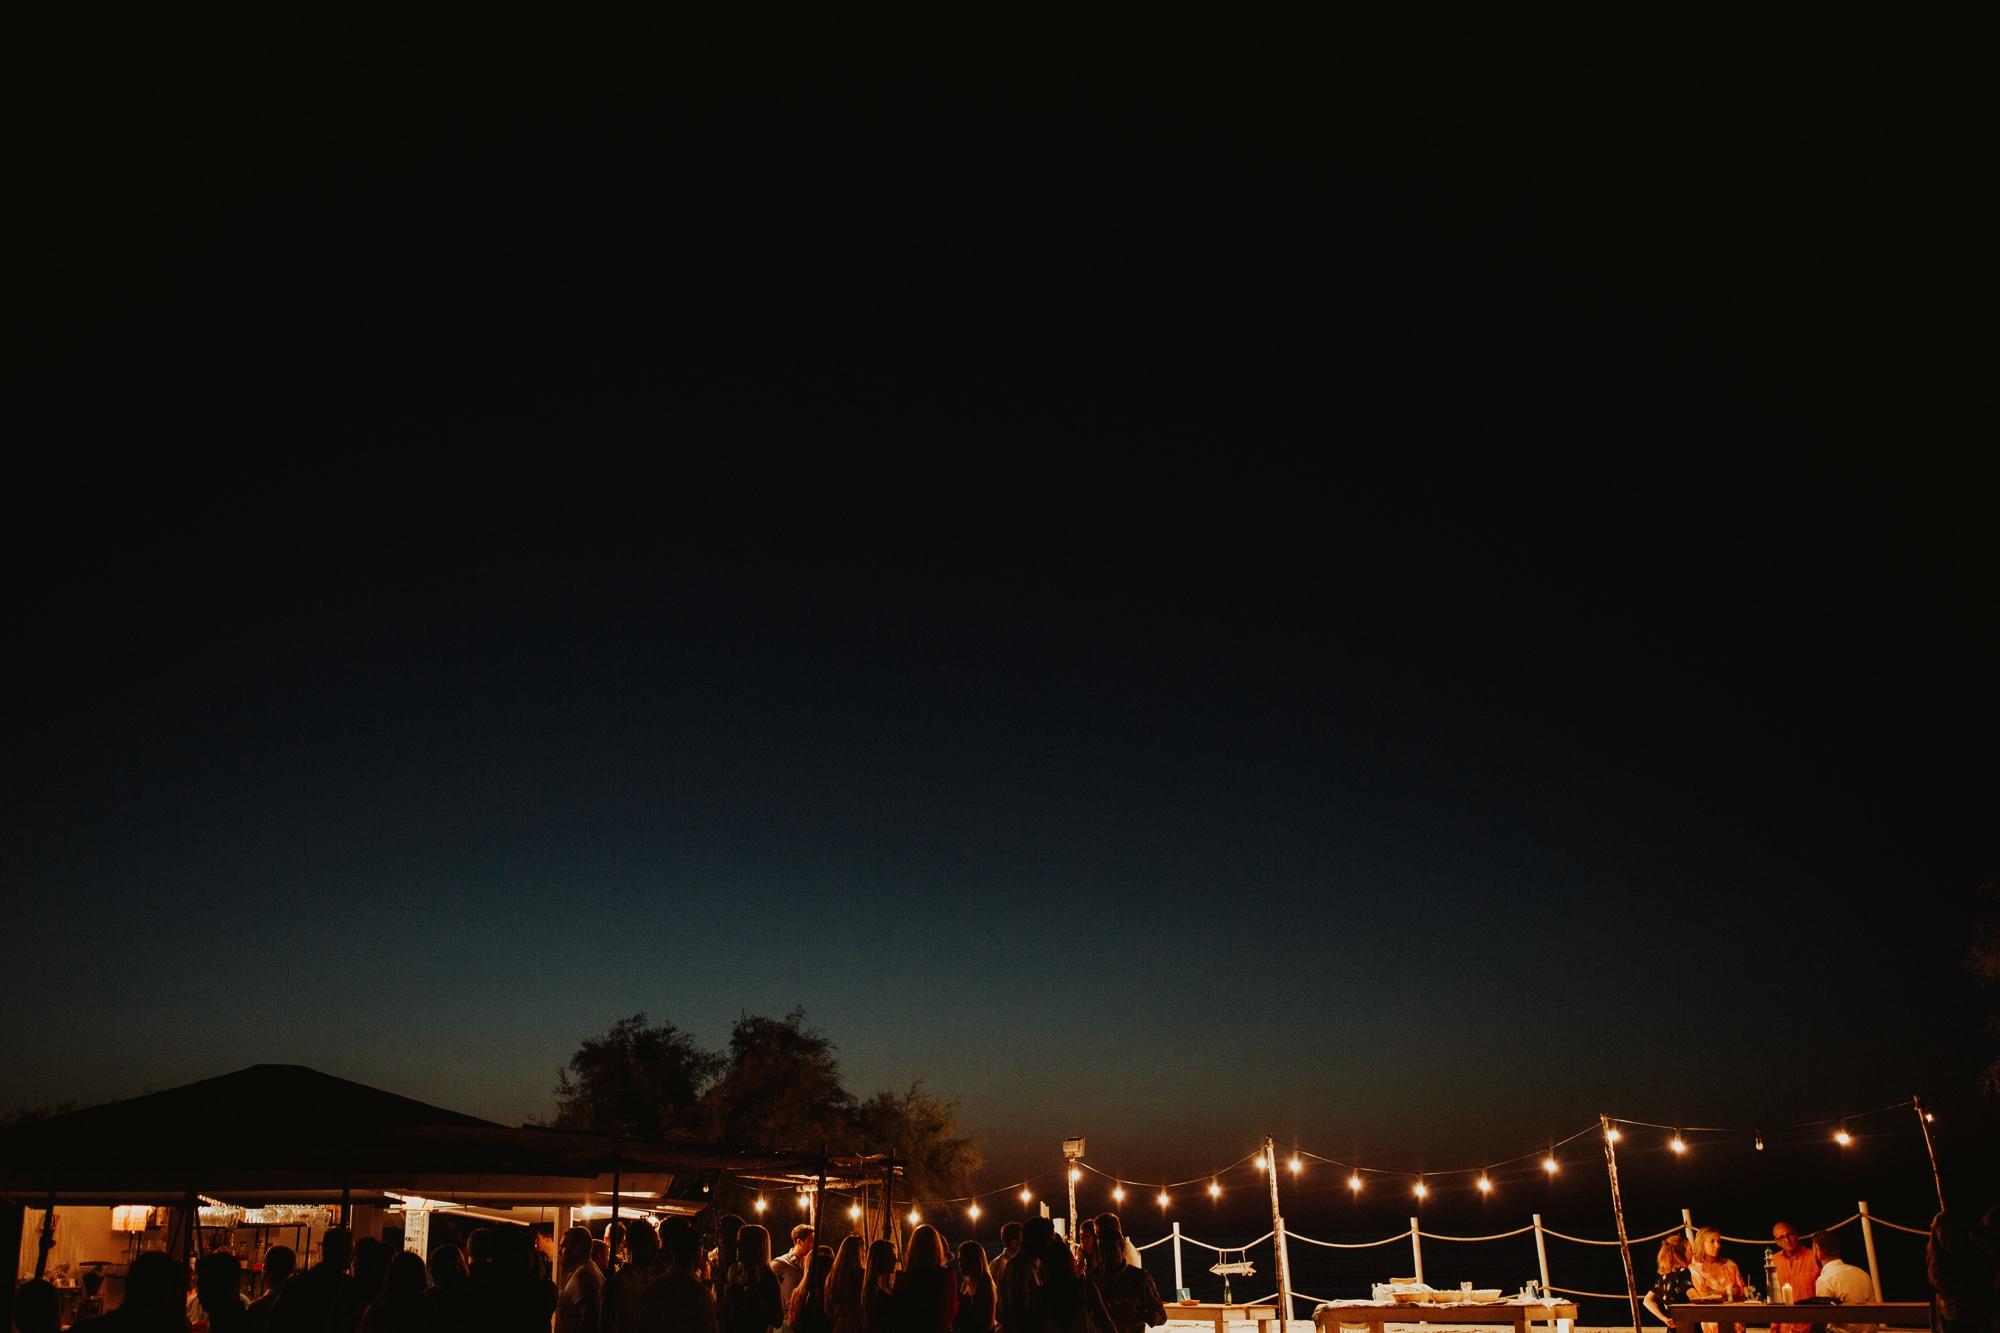 0000000016_0X7A0368_Weddings_Destination_Italy_got_Just_Engaged.jpg